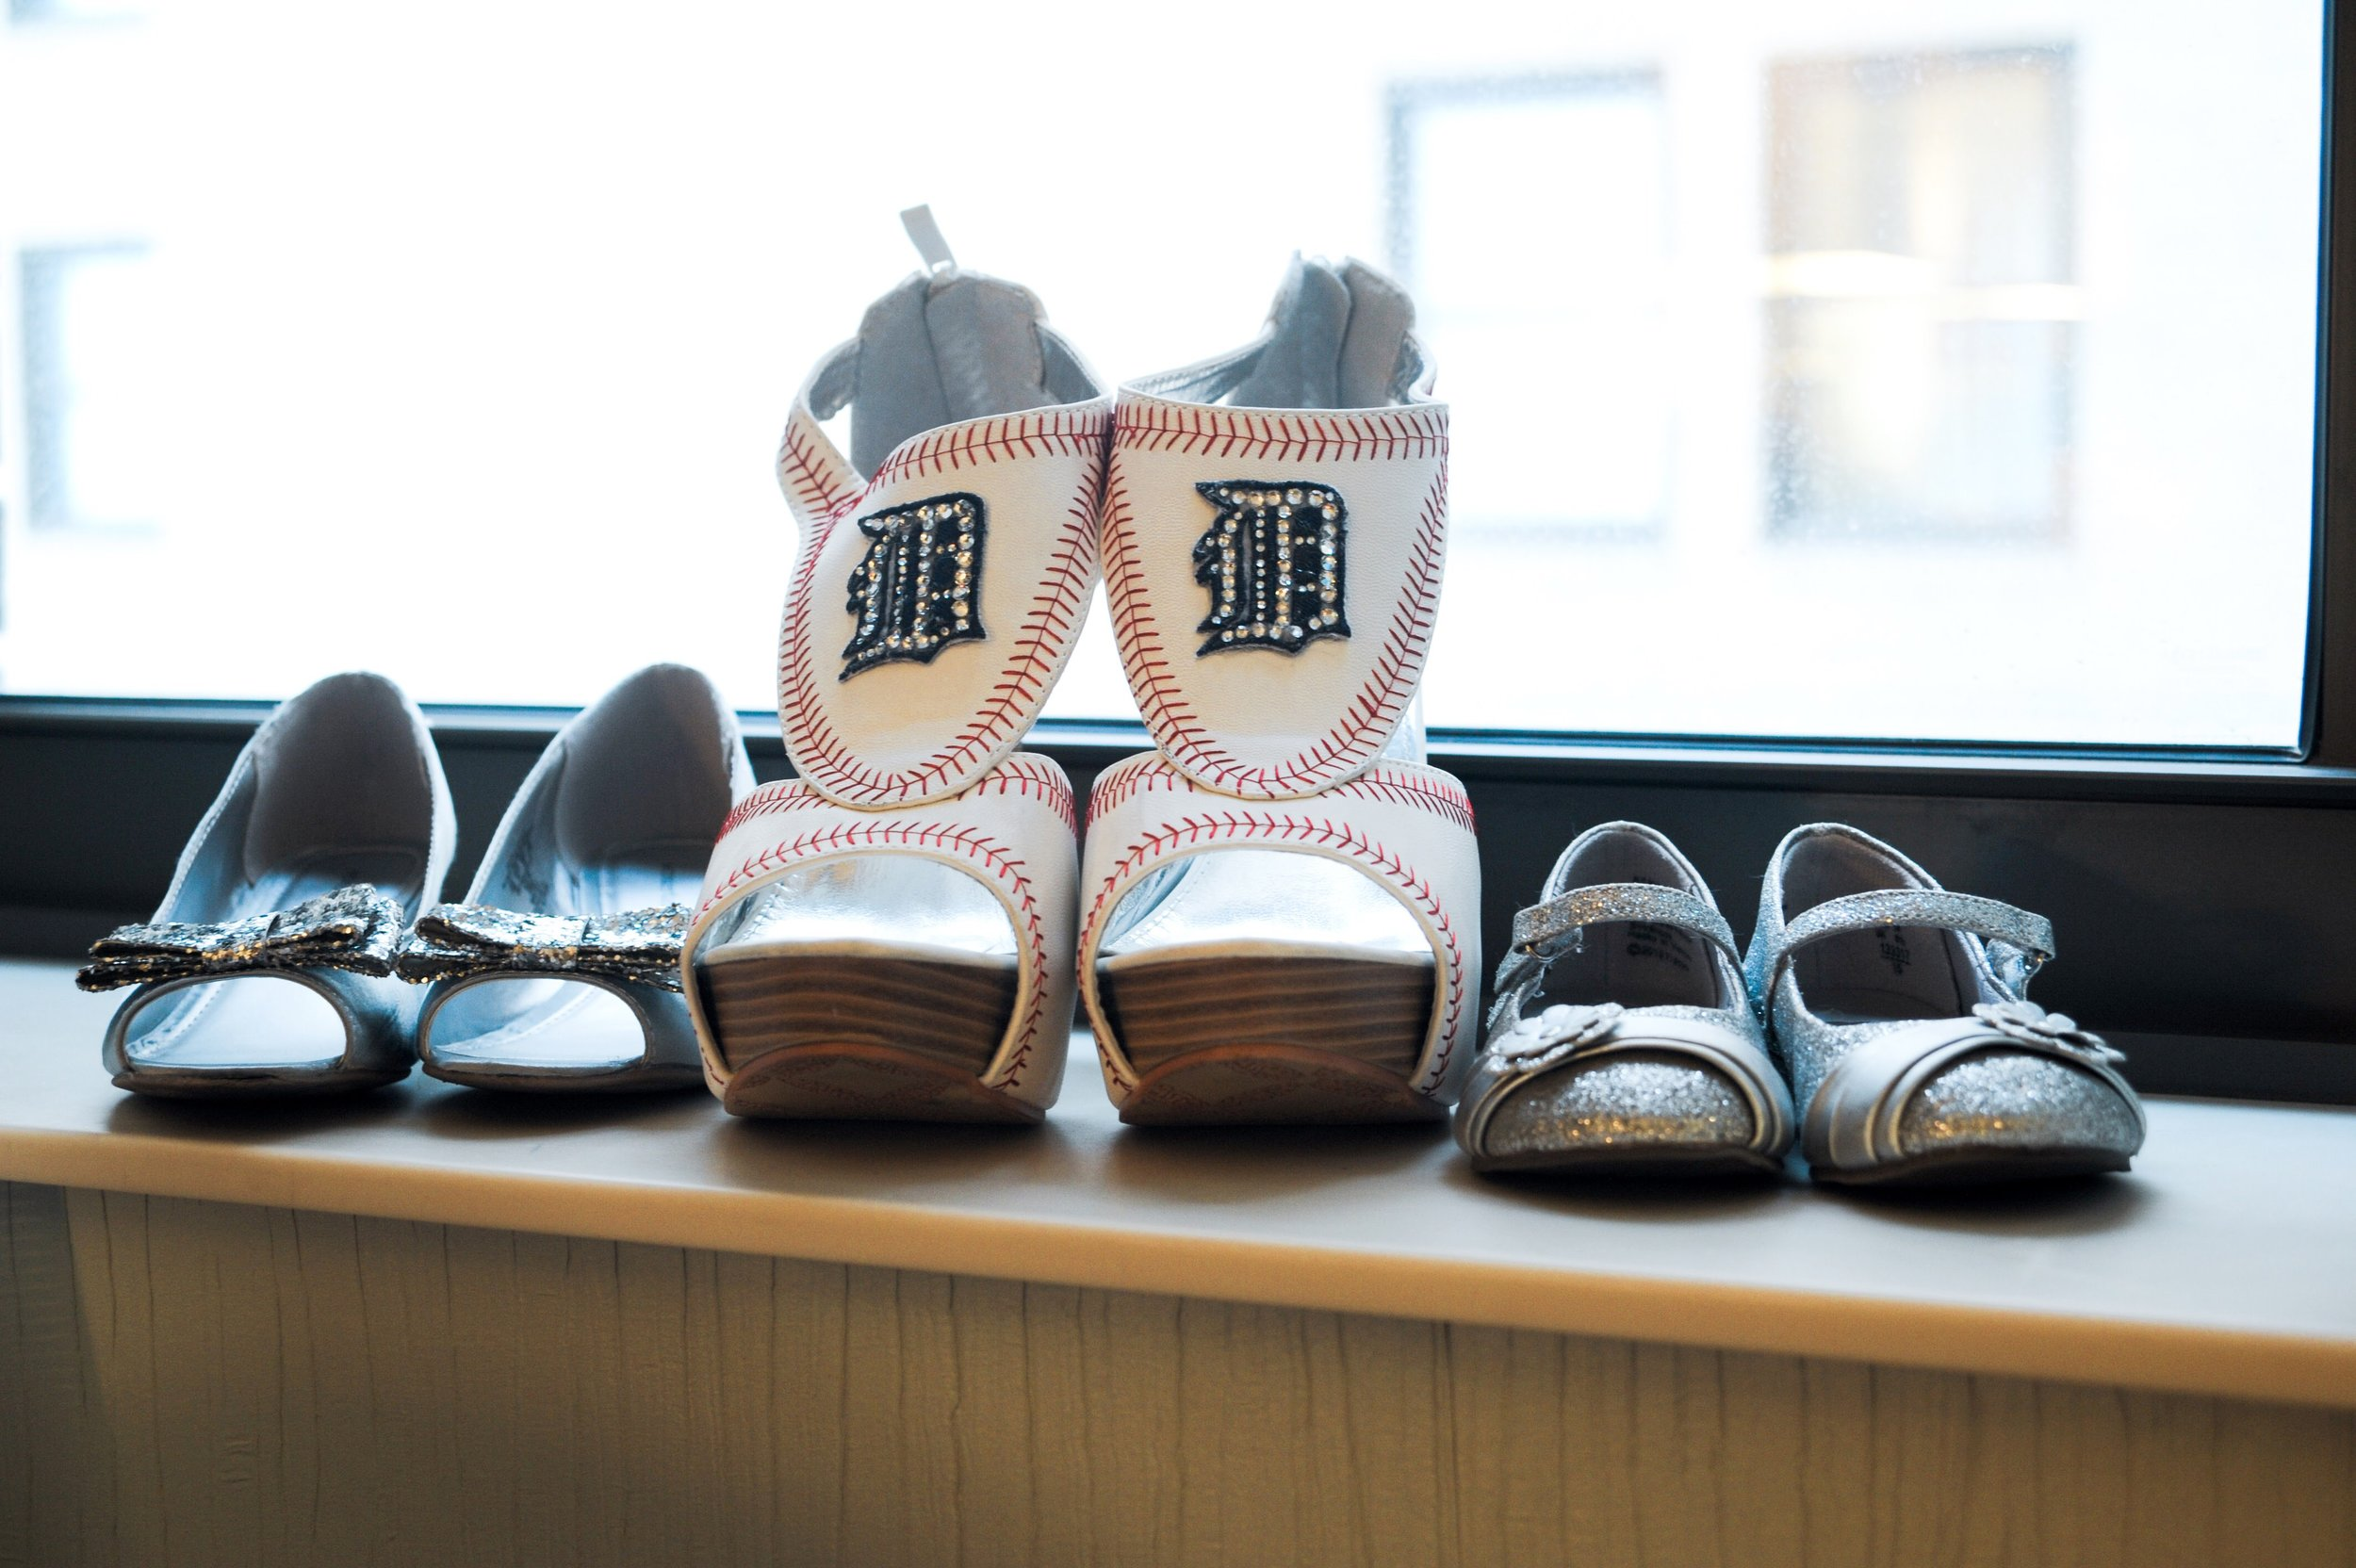 Detroit baseball shoes.jpg